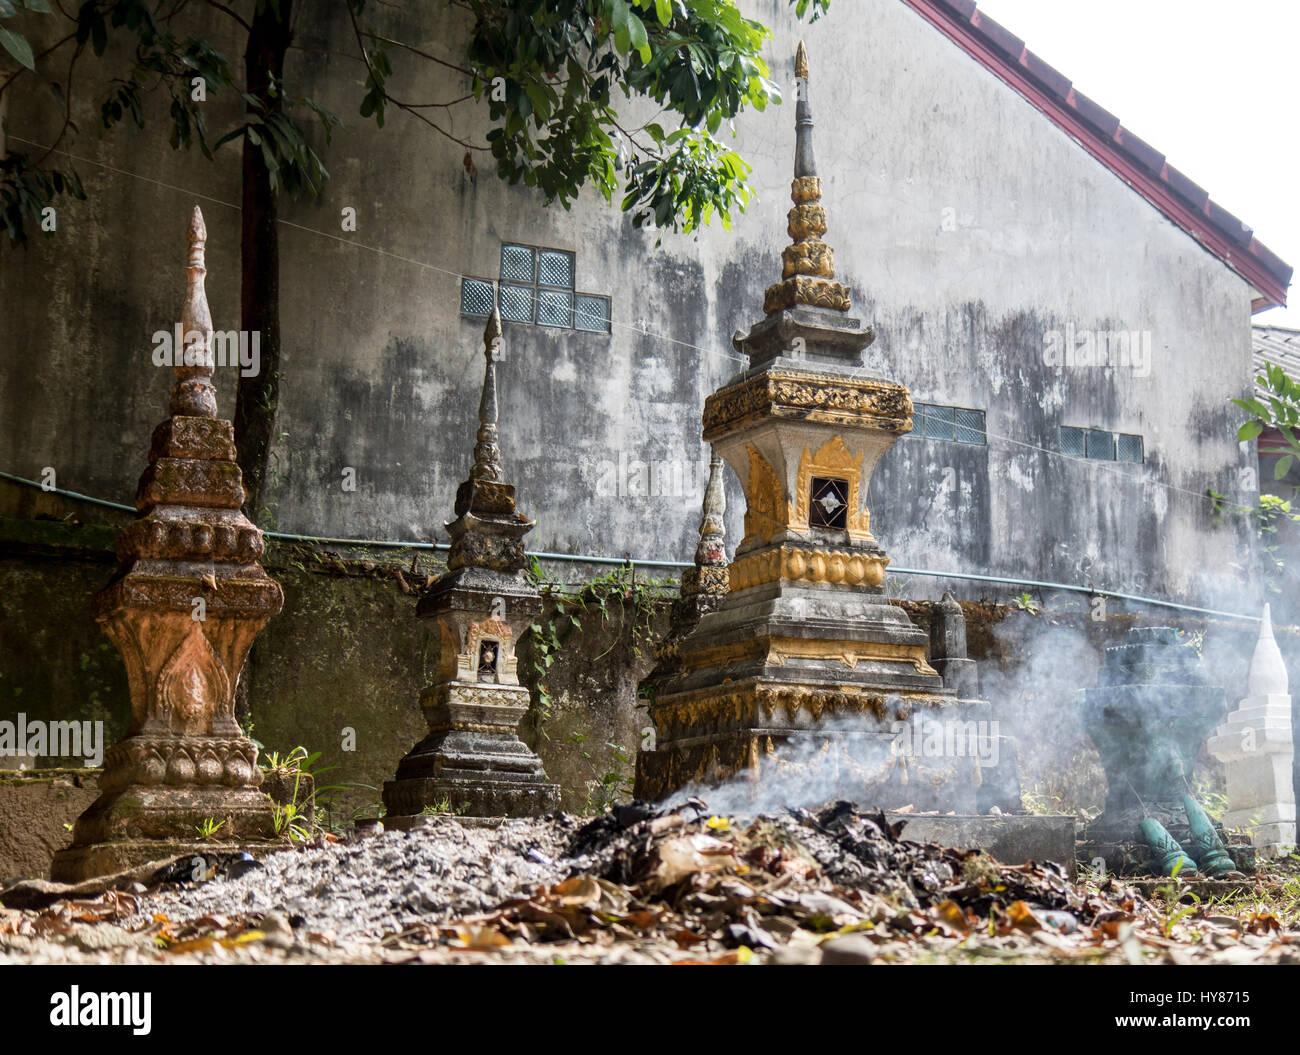 burning waste at the ossuary at a Buddhist monastery Wat Si Sou Mang , Vang Vieng, Vientiane Province, Laos - Stock Image